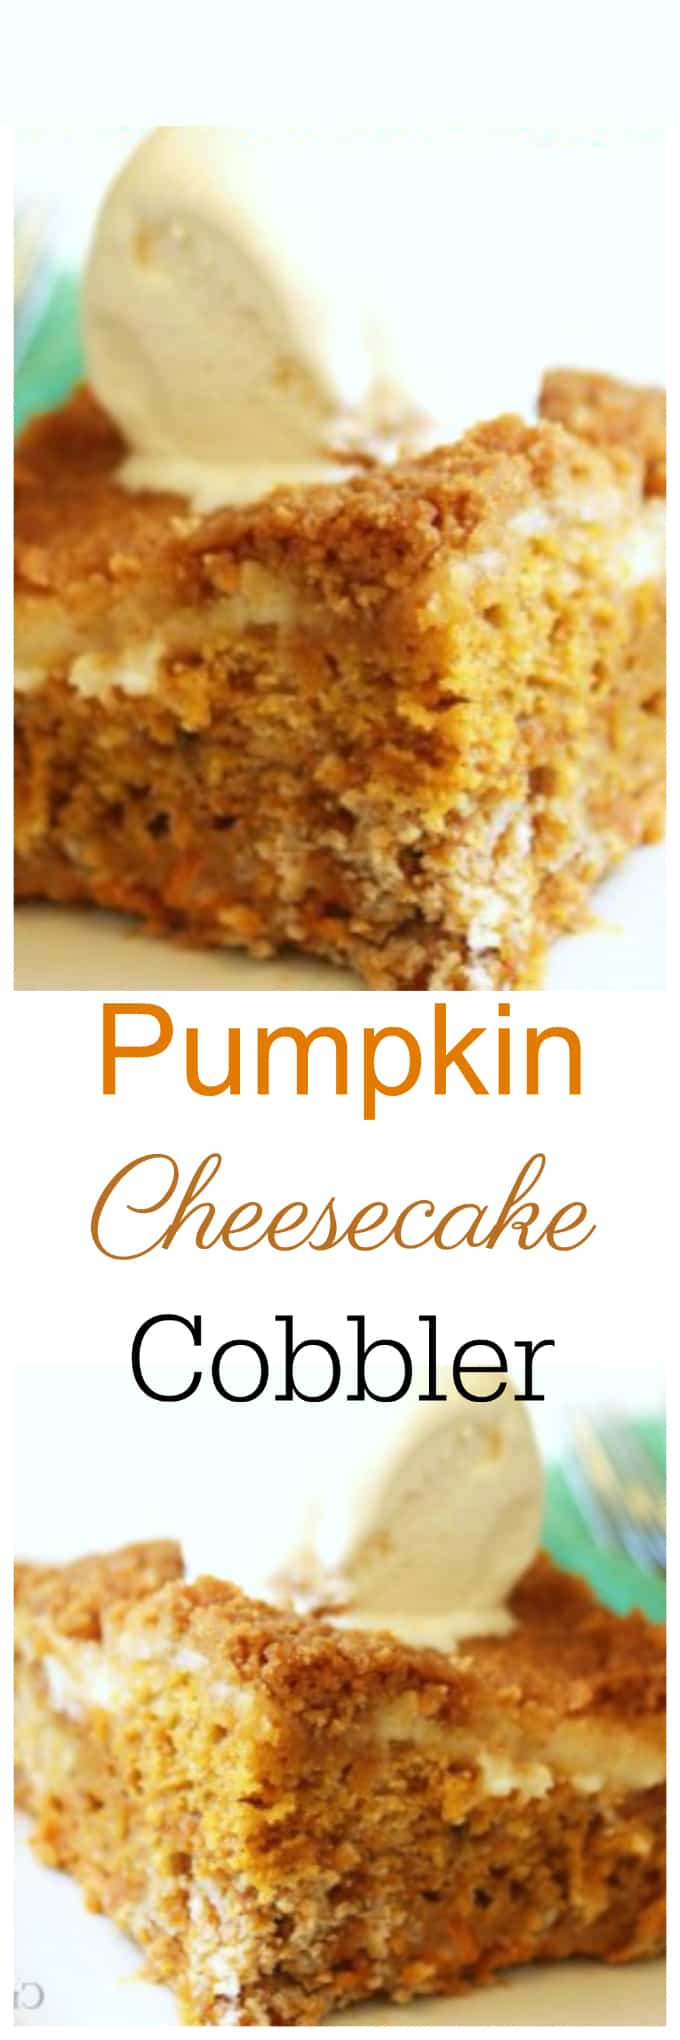 Pumpkin Cheesecake Cobbler   Created by Diane